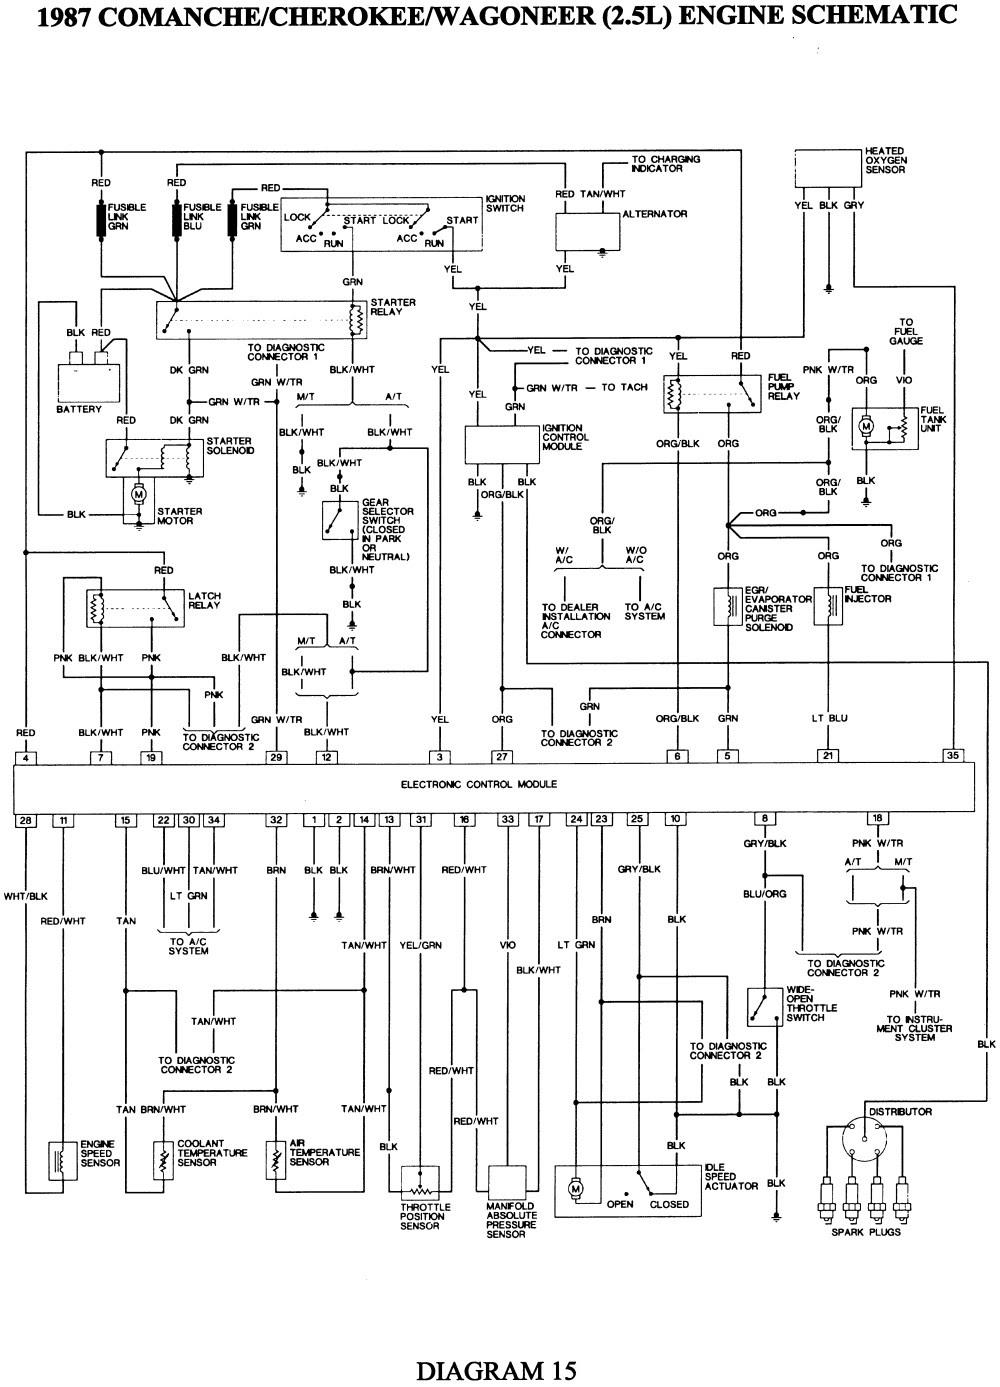 Diagram Grand Cherokee Fan Wiring Diagram Full Version Hd Quality Wiring Diagram Customwiringdfw Media90 It